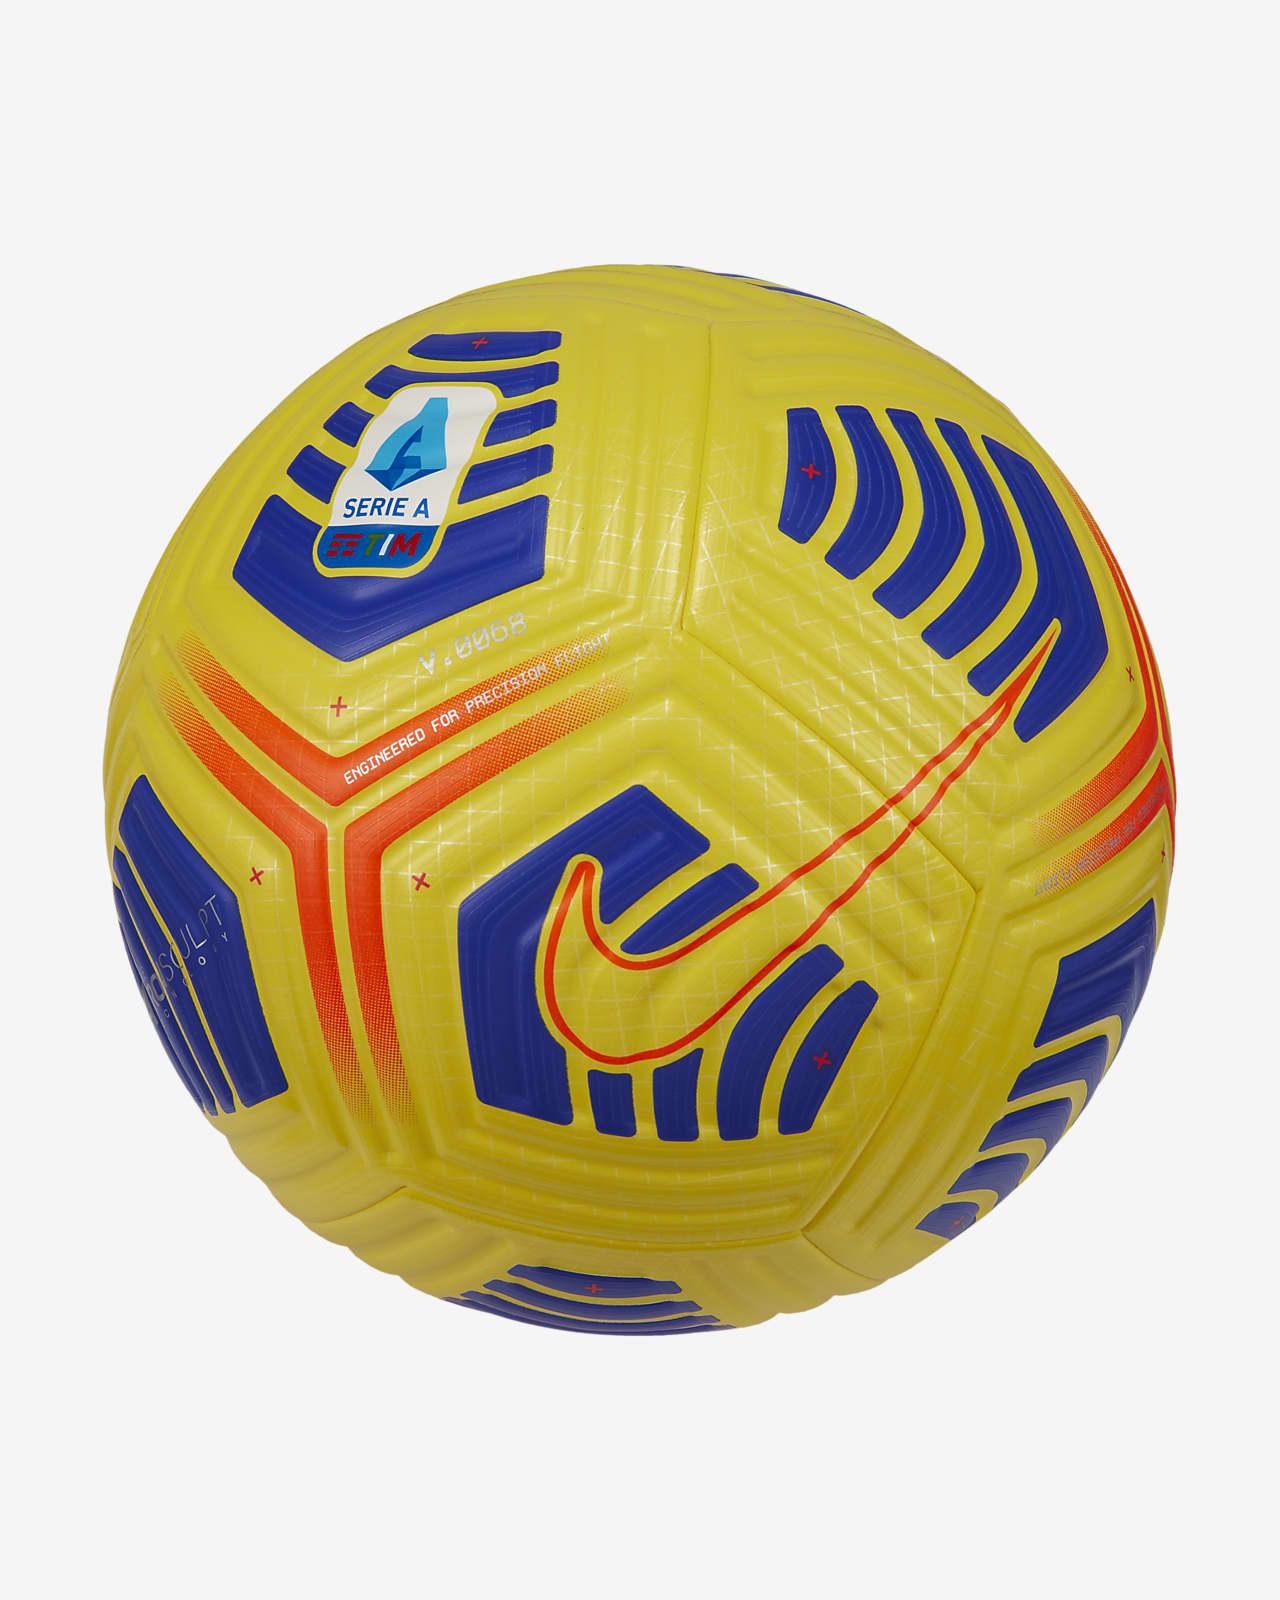 Serie A Flight Football